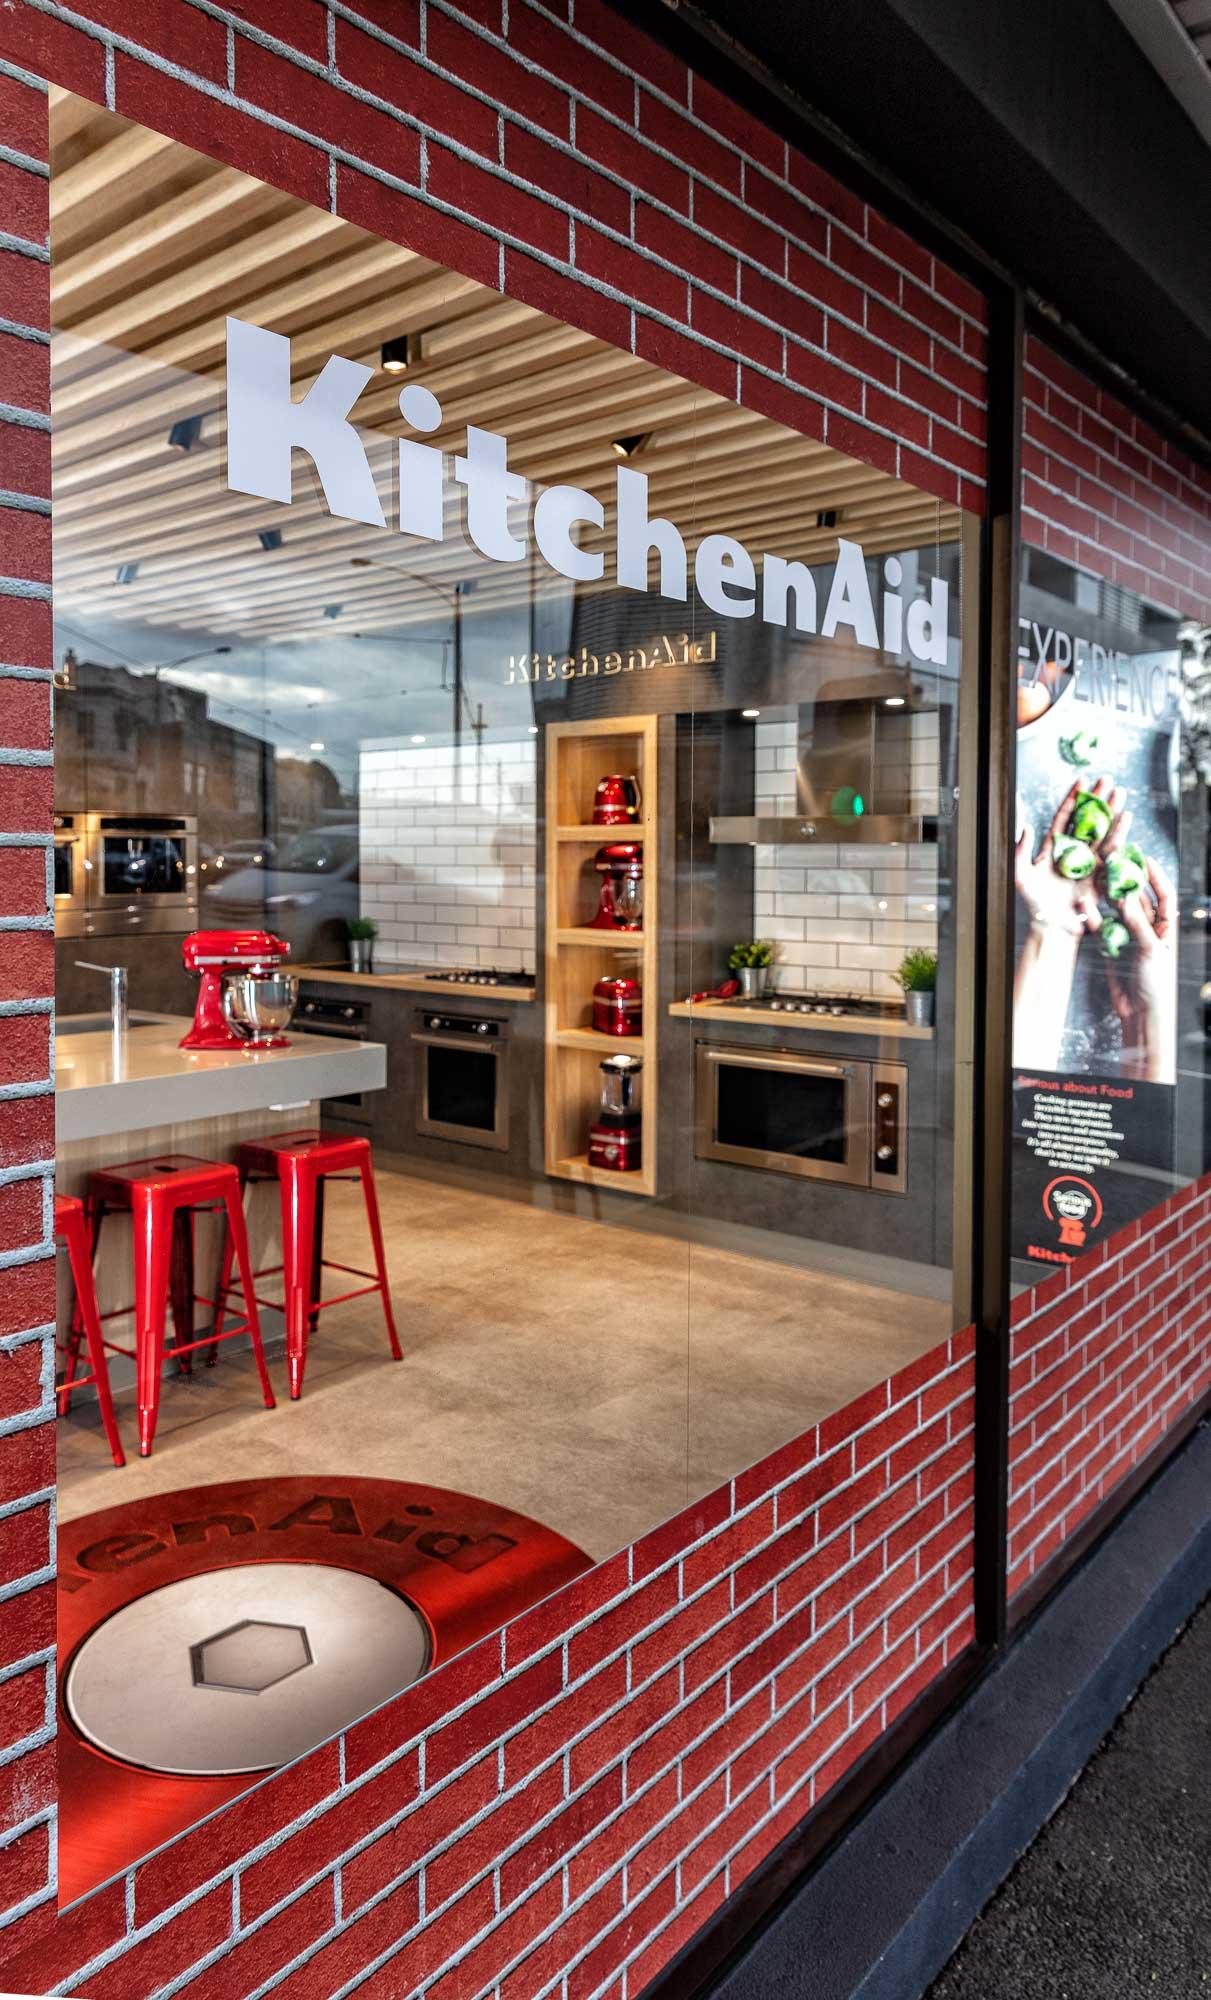 Kitchenaid display showroom - Advertising photography